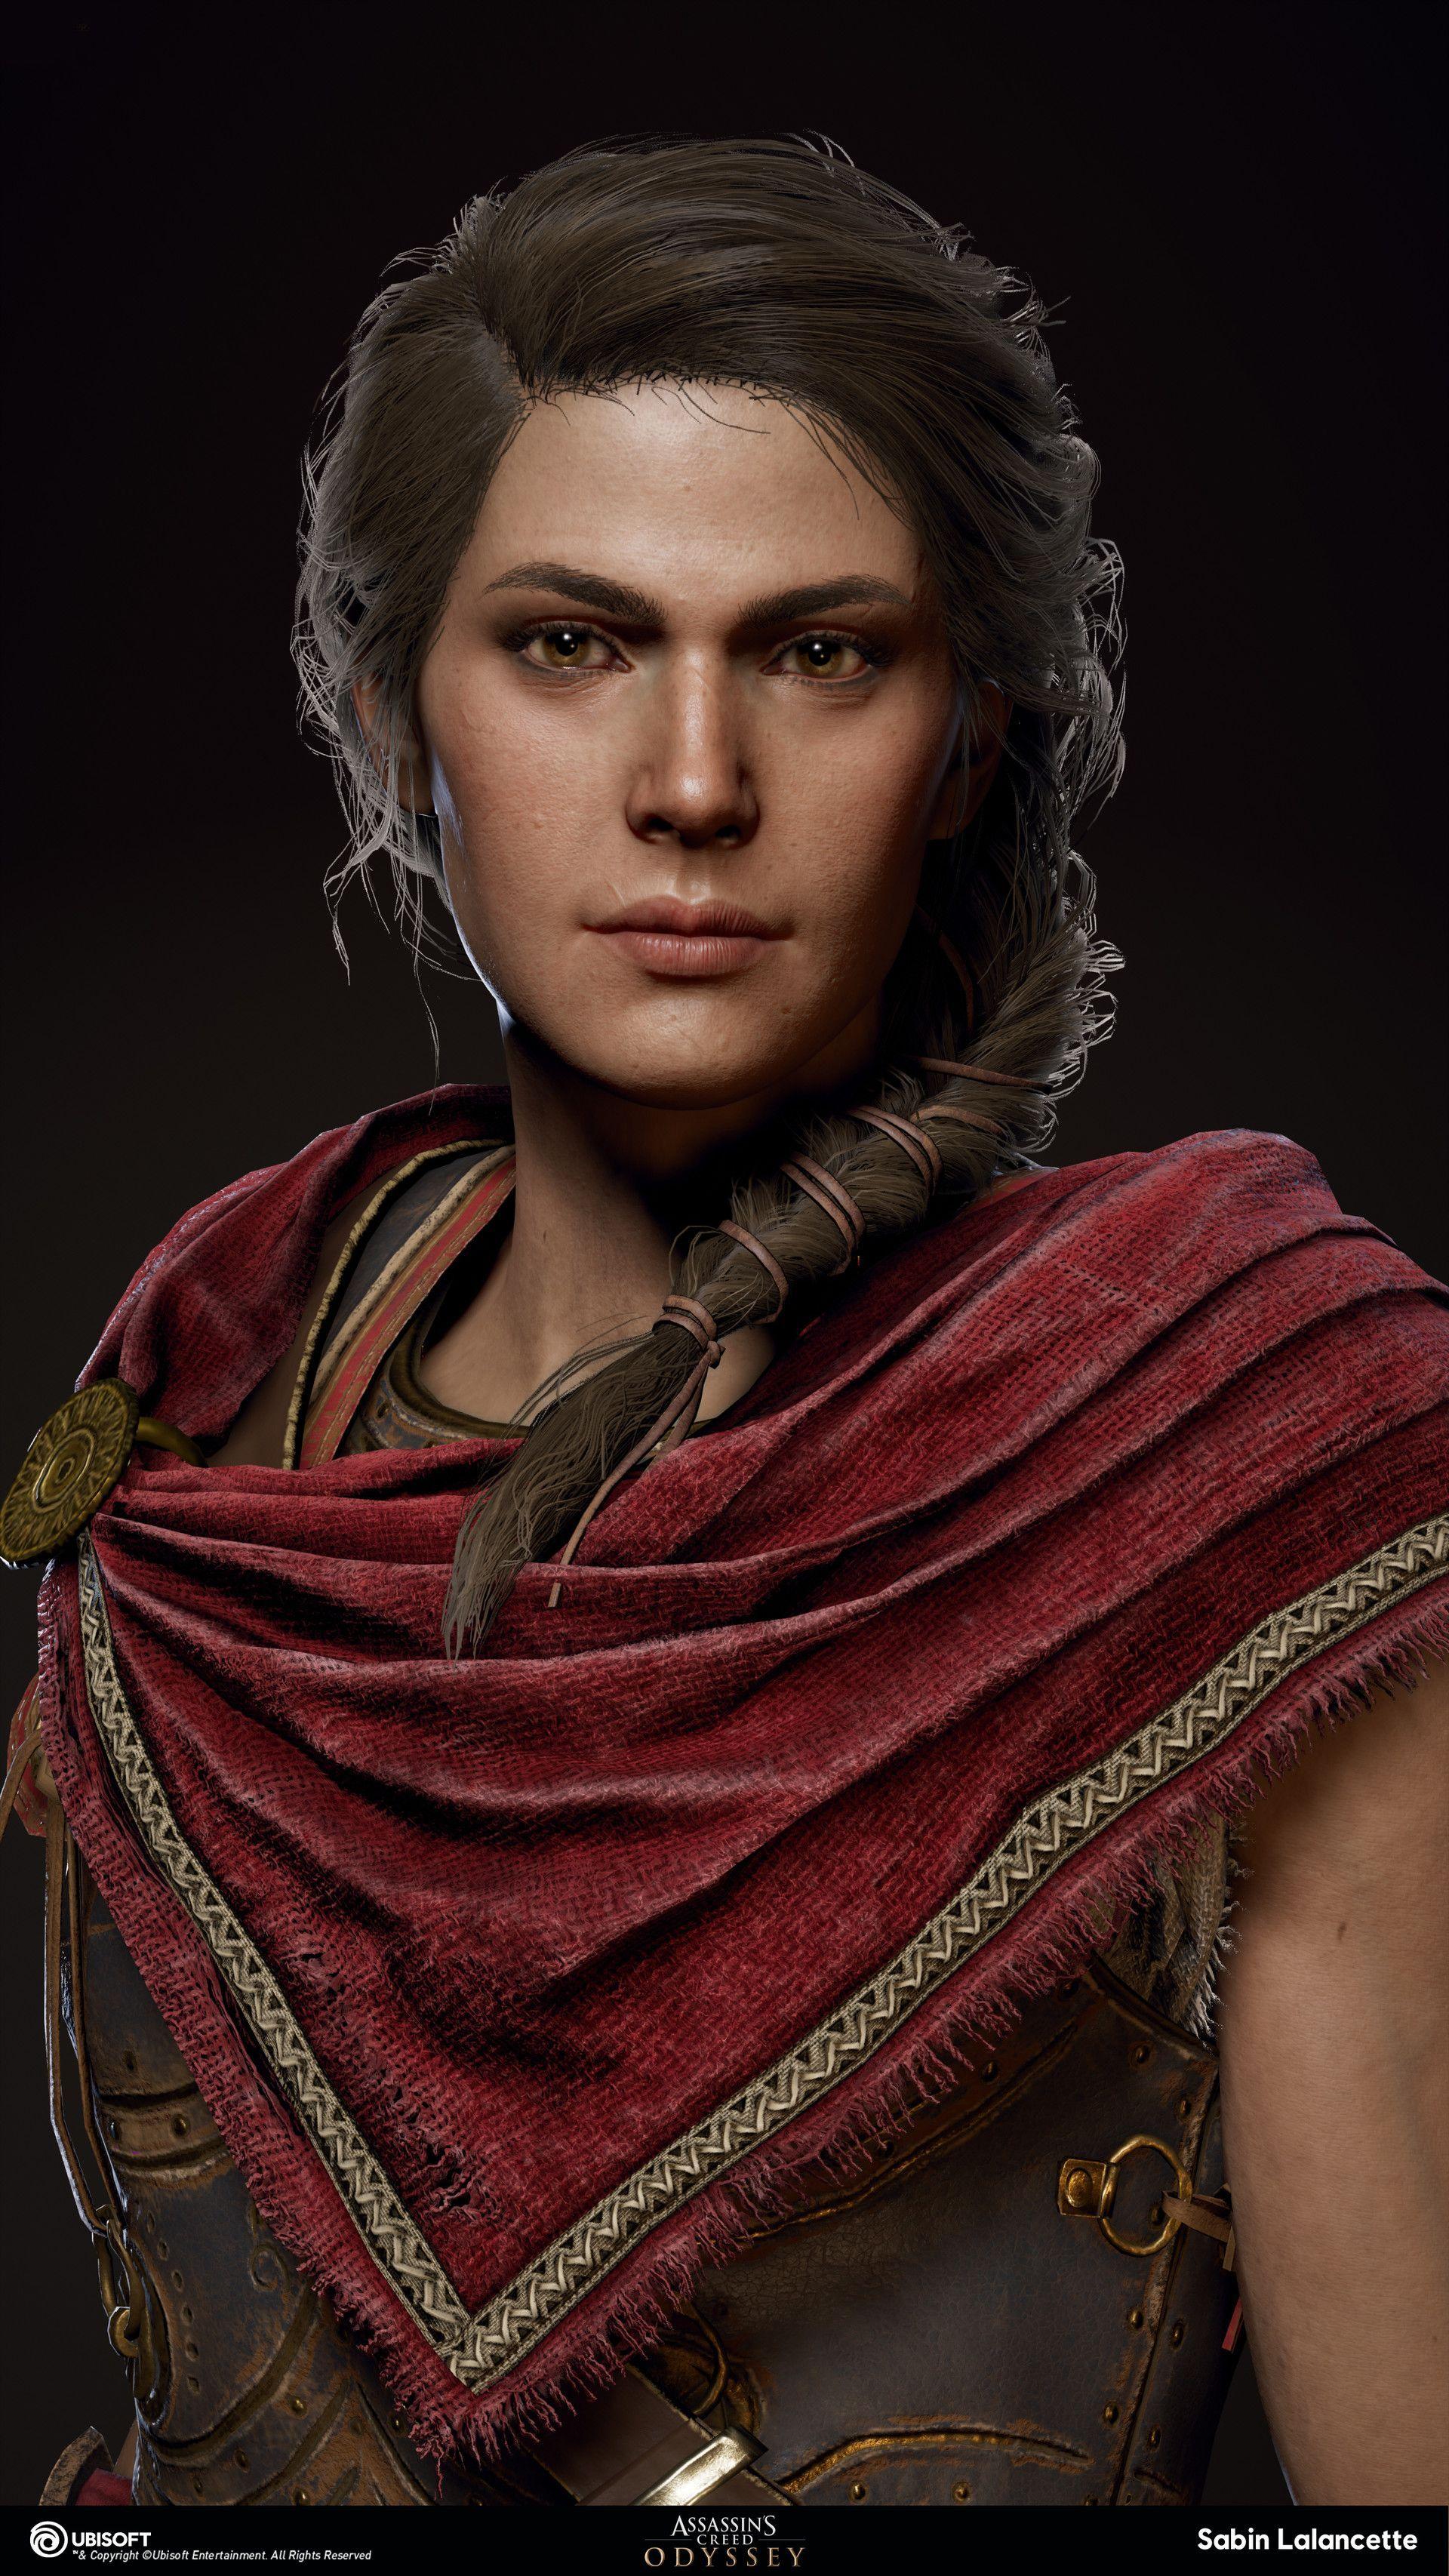 Pin By Cheesy Bookwormm On Kassandra Assassins Creed Artwork Assassins Creed Odyssey Assassins Creed